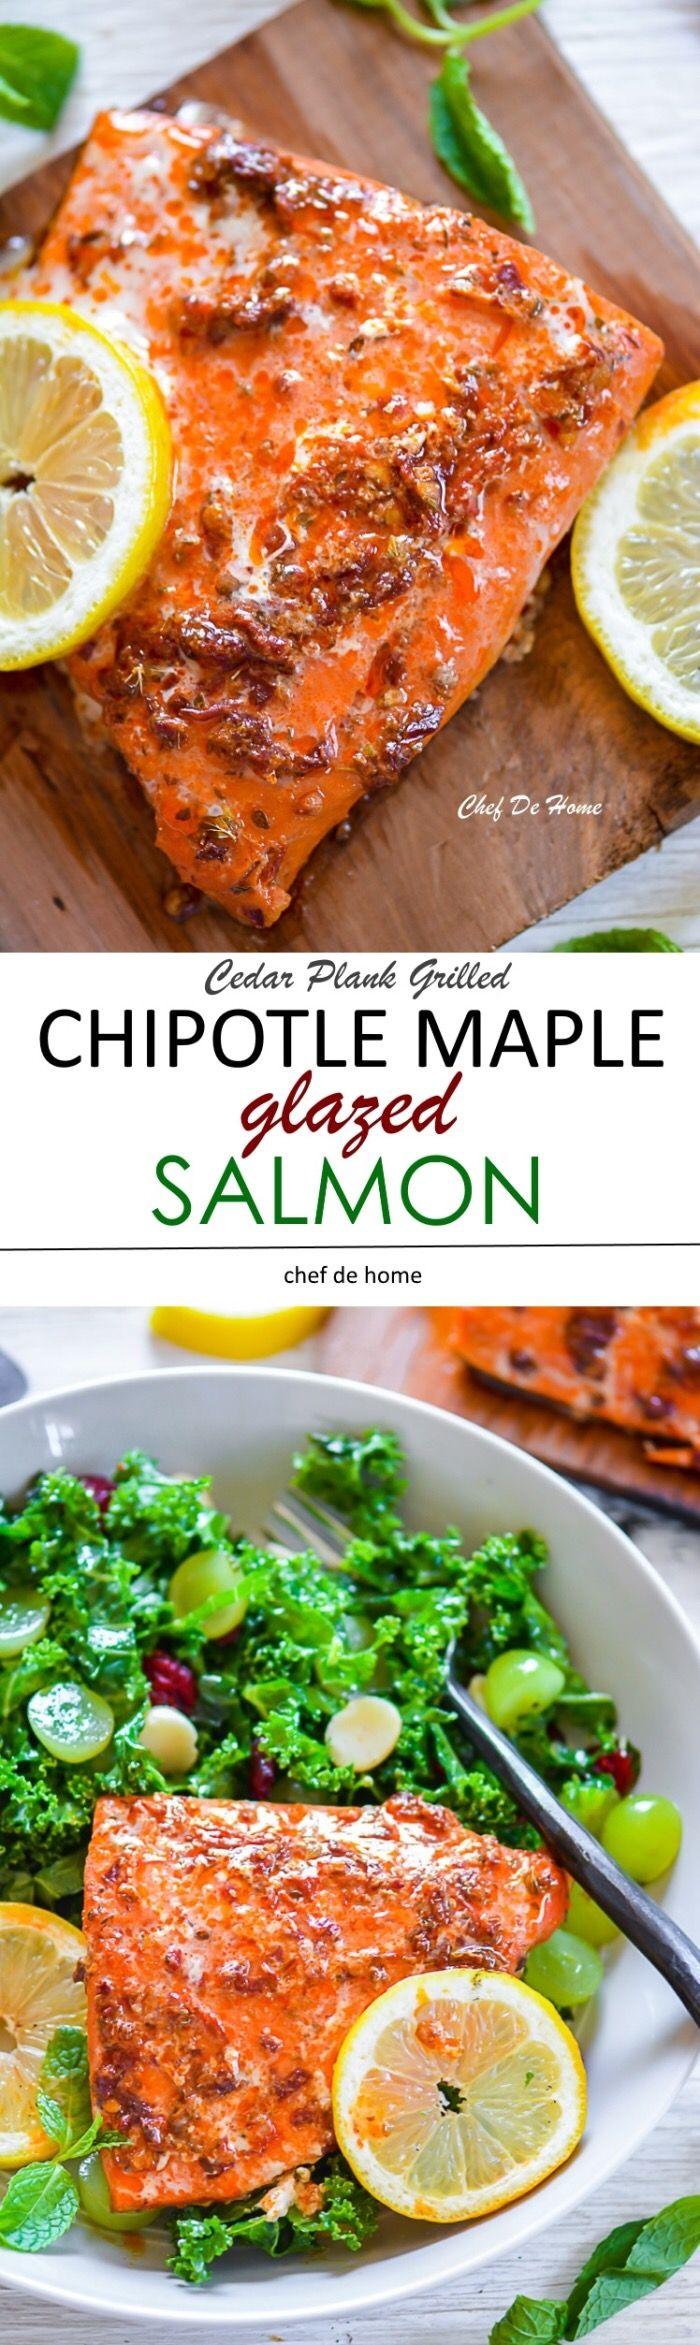 Cedar Plank Grilled Chipotle Maple Glazed Salmon Recipe | www.chefdehome.com/